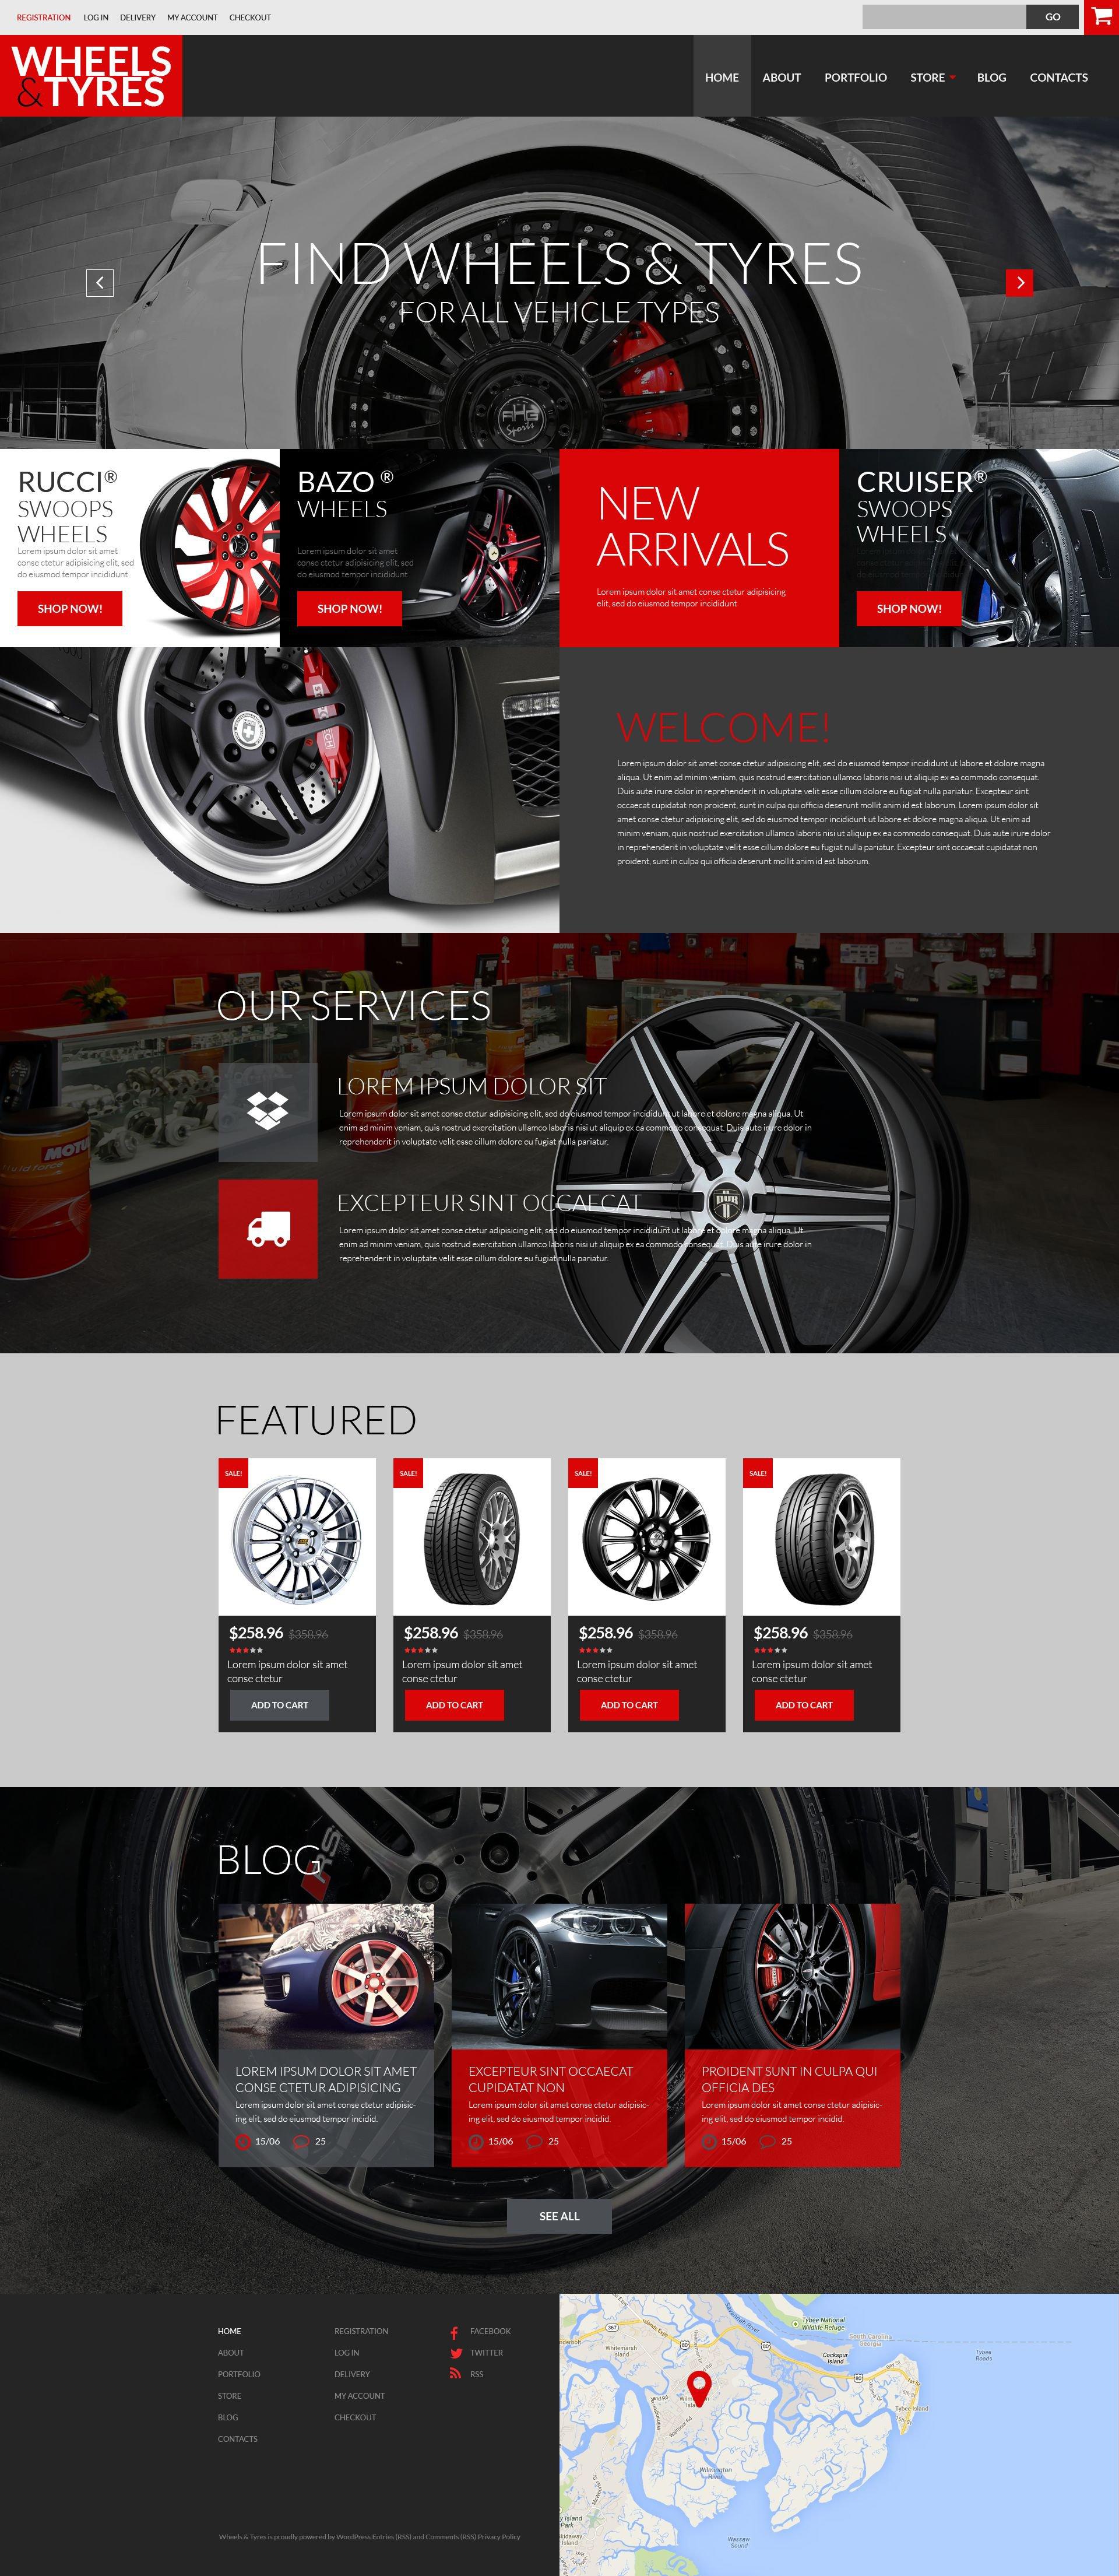 """Car Parts  Accessories"" - адаптивний WooCommerce шаблон №52145"